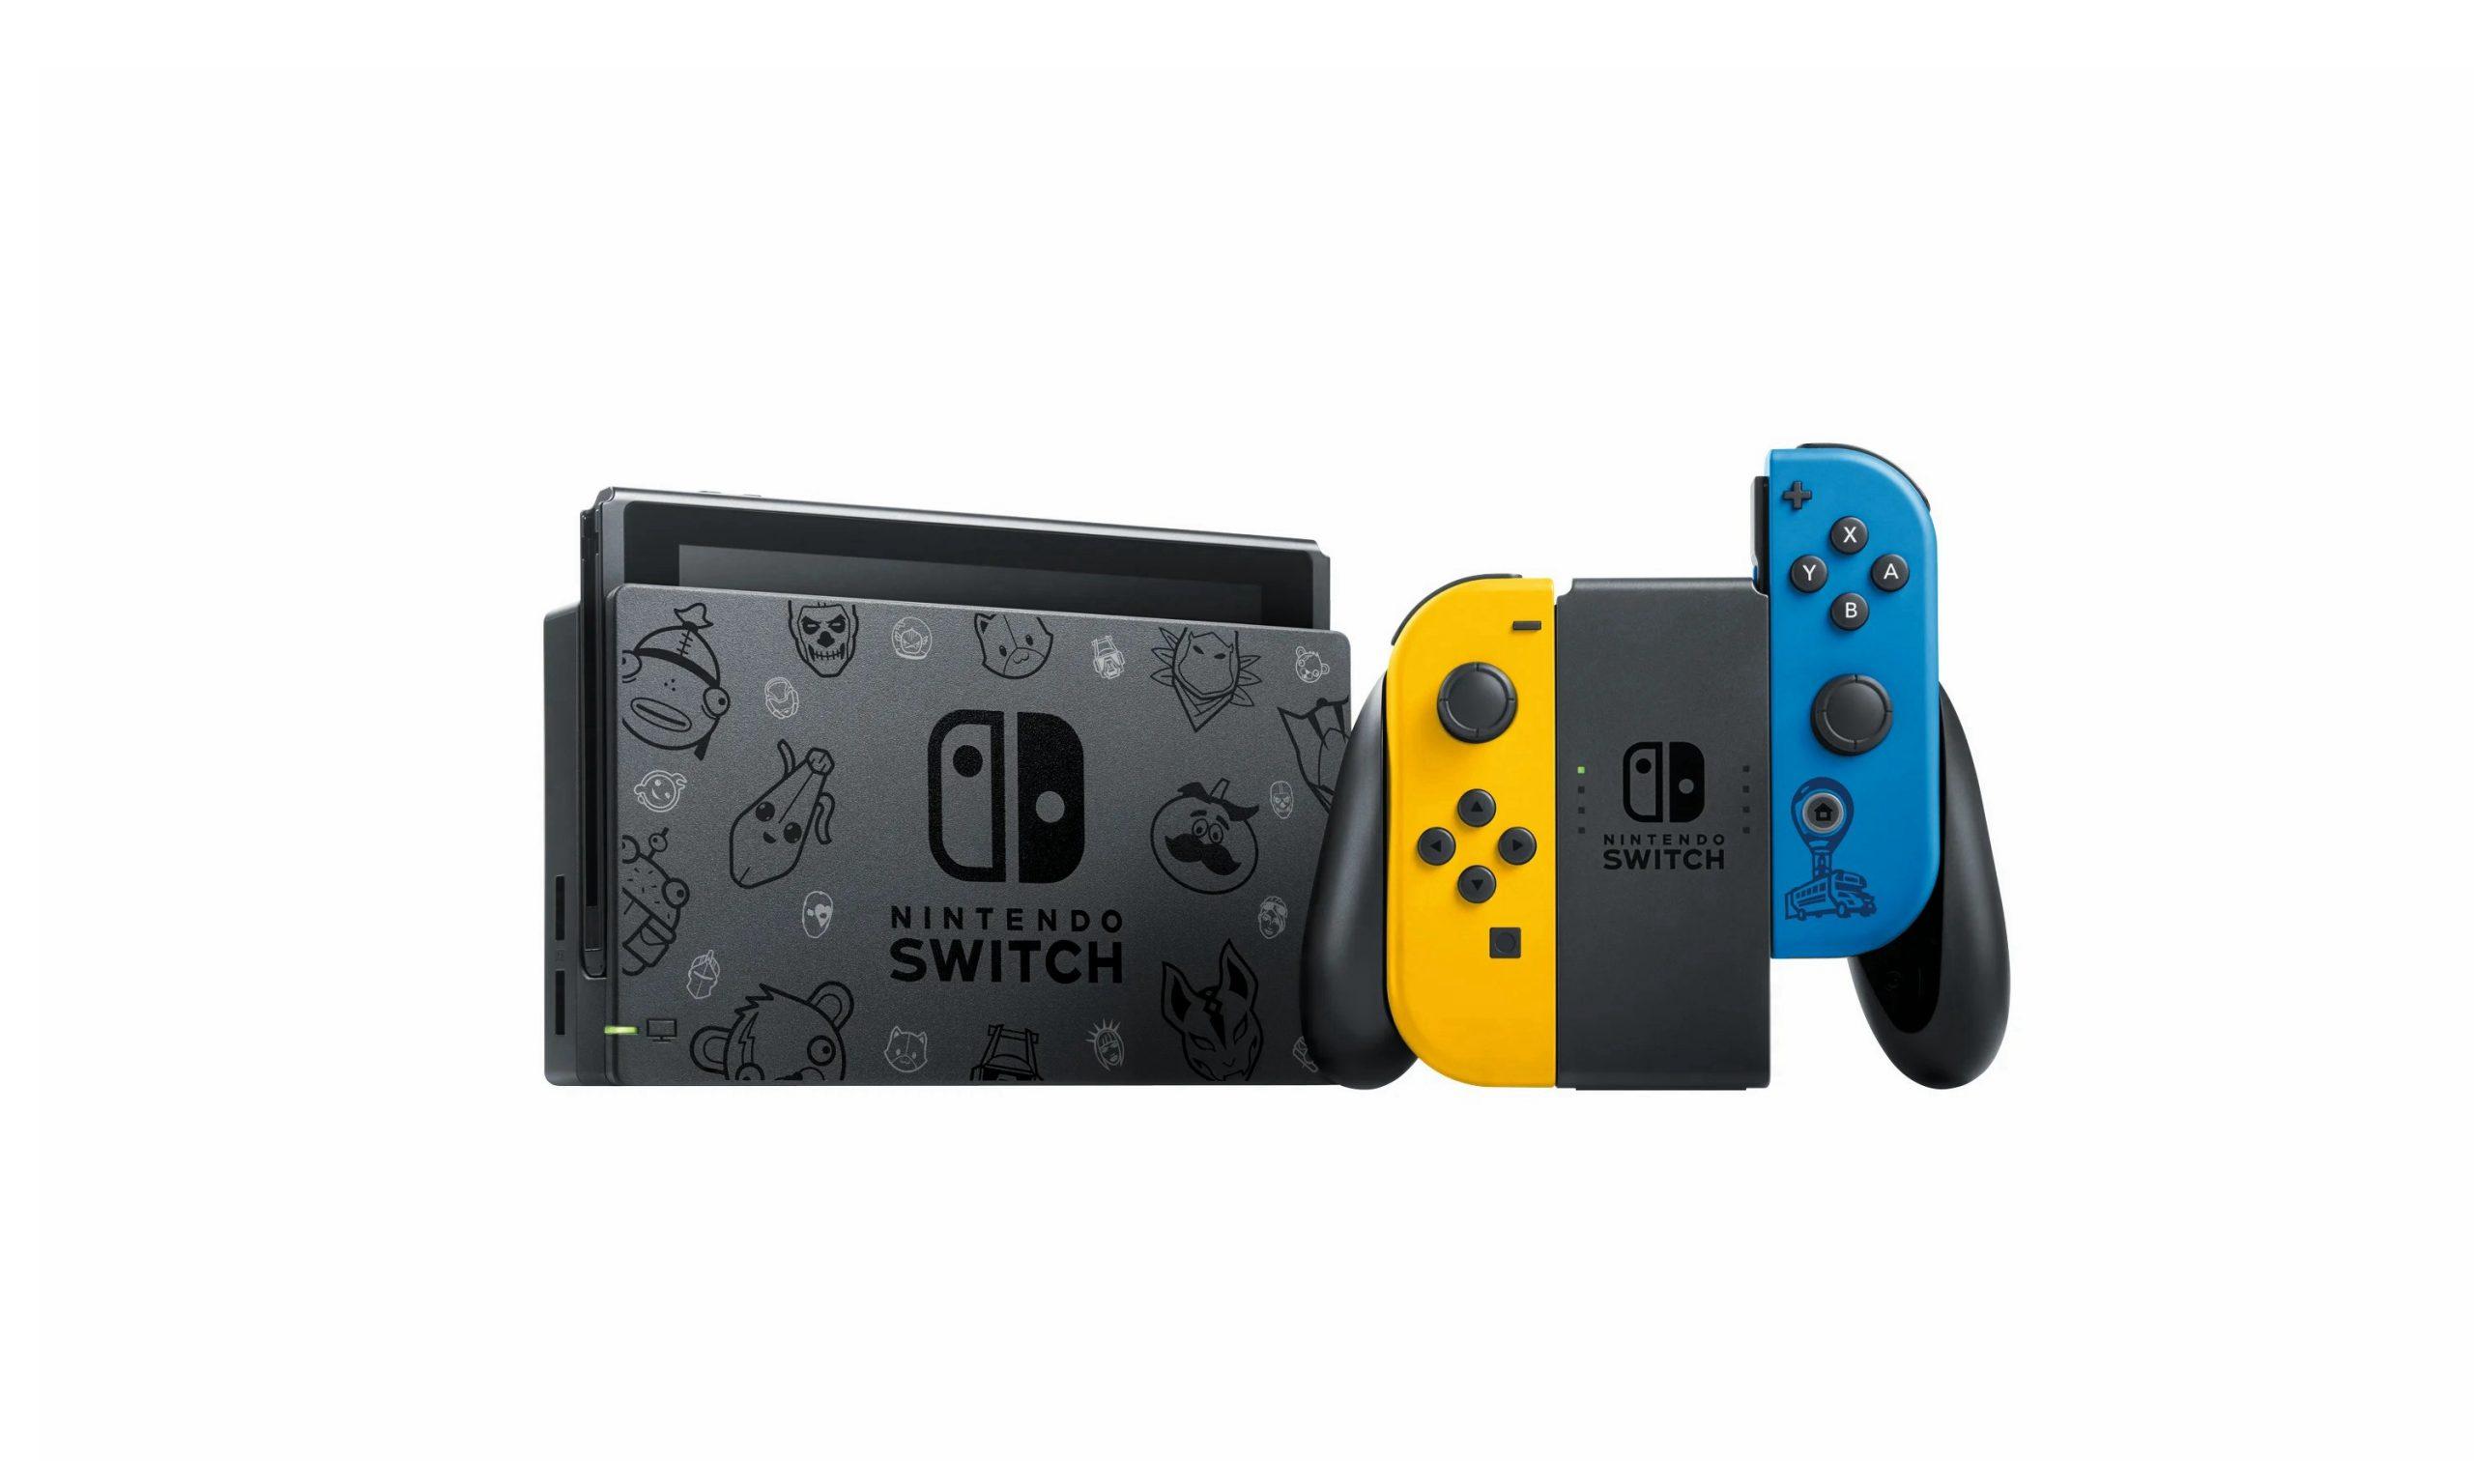 Nintendo 任天堂将推出《堡垒之夜》限定版 Switch 游戏主机